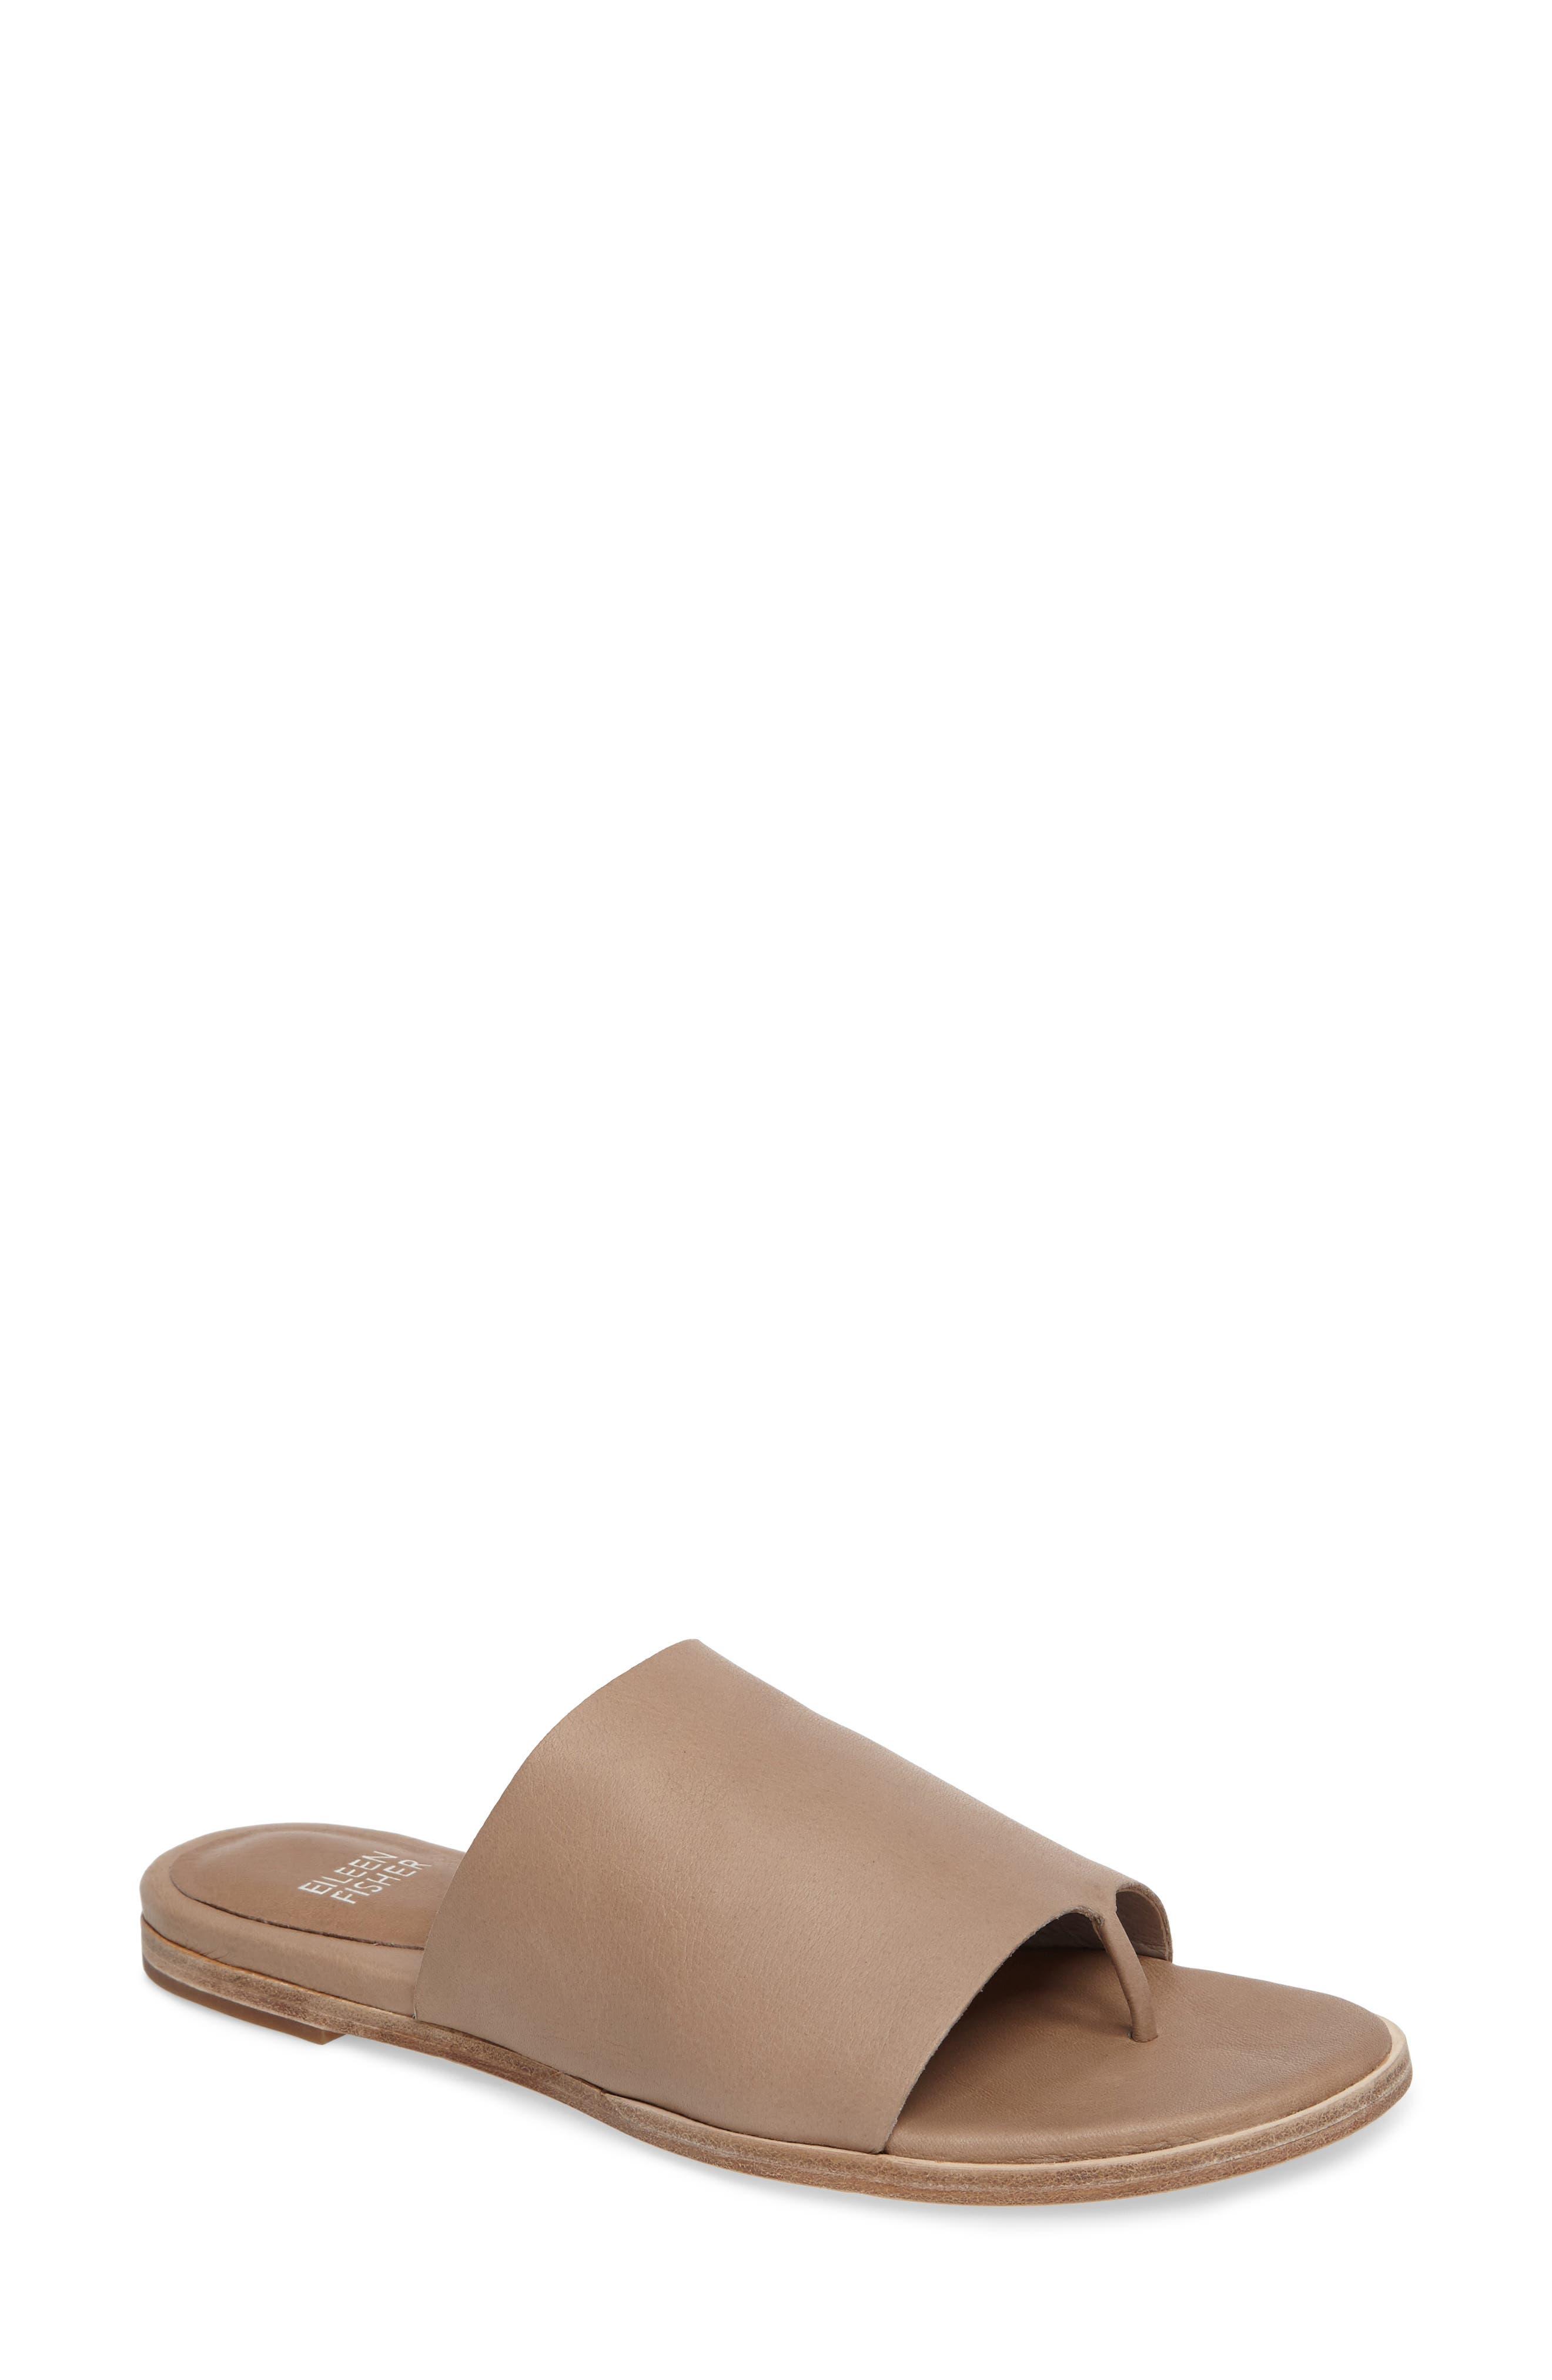 Eileen Fisher 'Mere' Thong Sandal (Women)